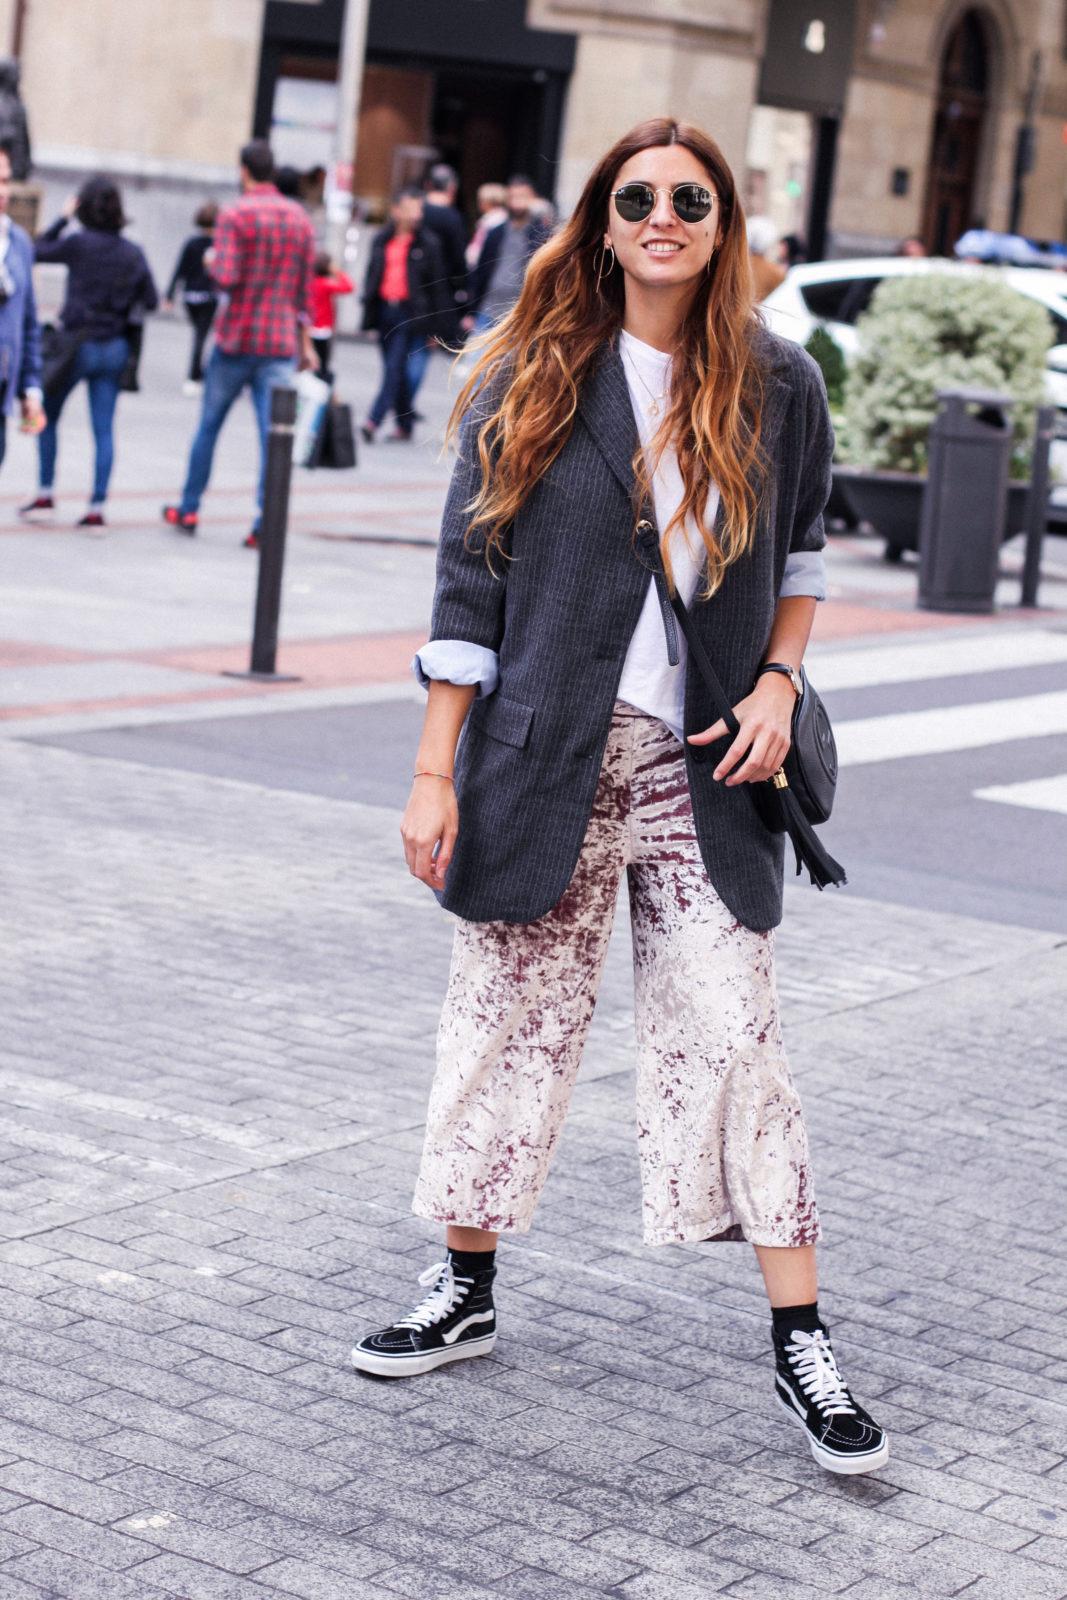 pantalones_terciopelo_rosa_pull_and_bear_blazer_vans_pendientes_aros_gucci-18